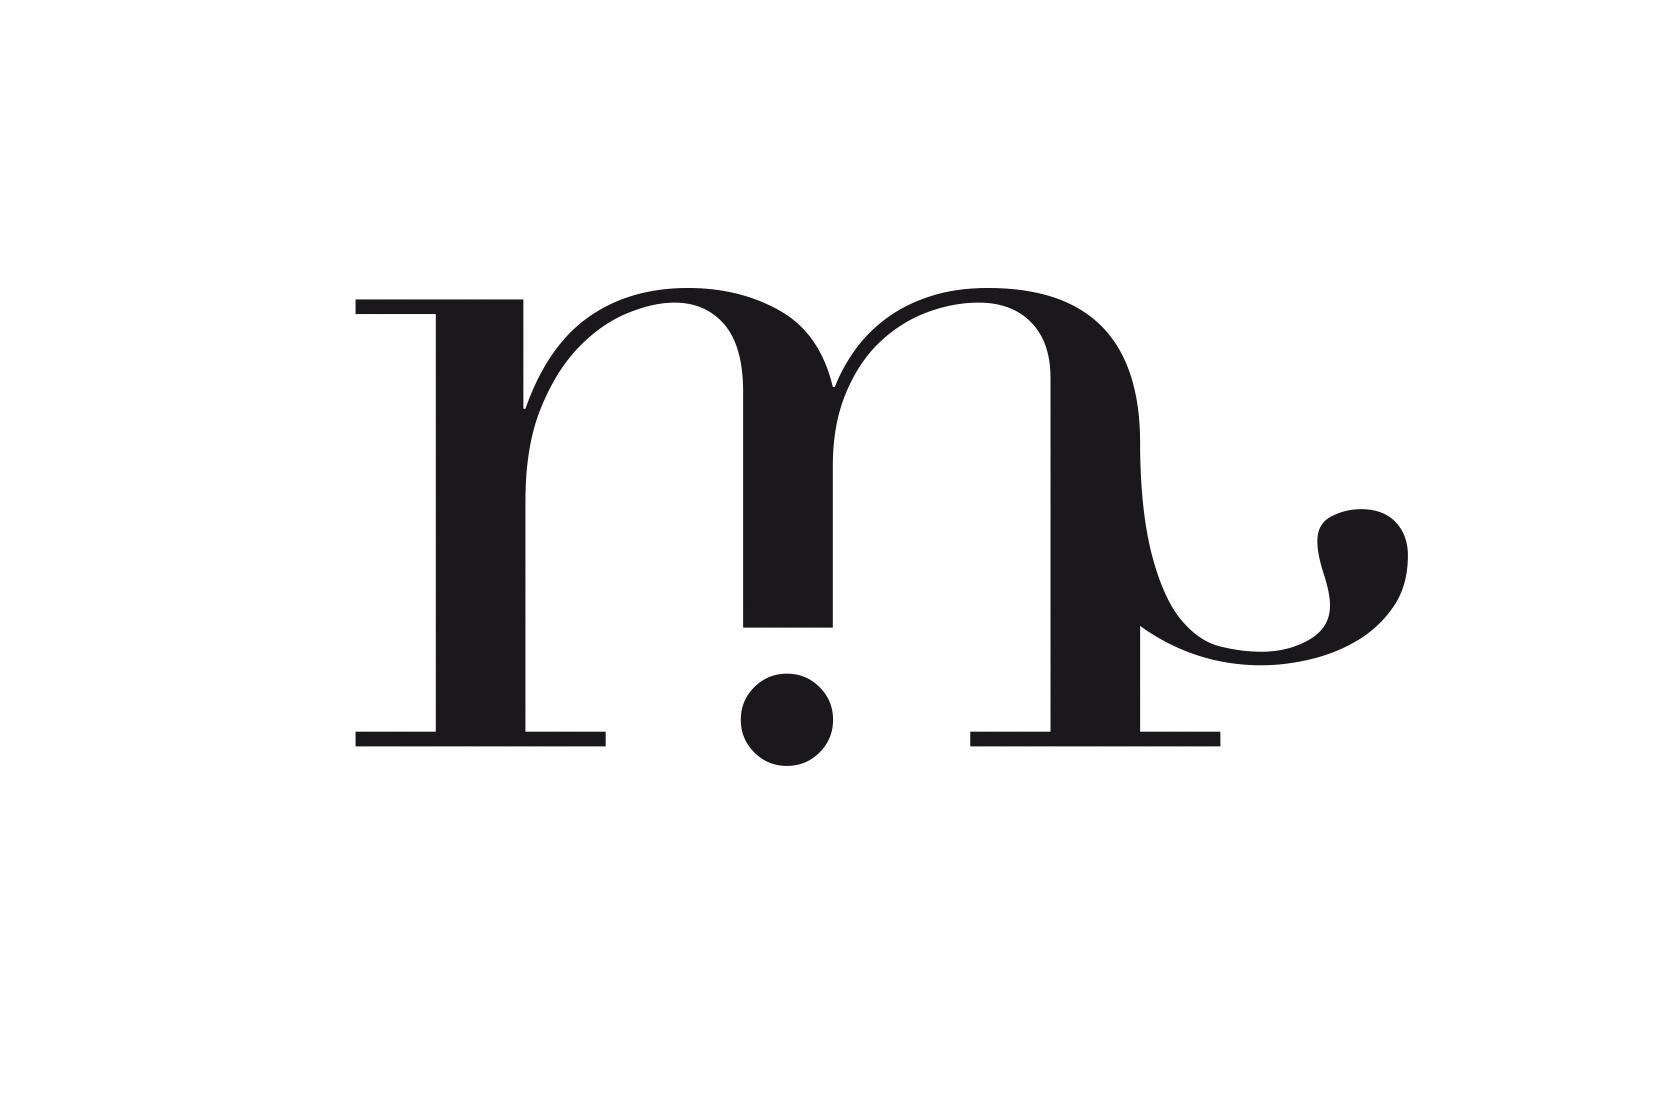 silvio cocco sms didot typography